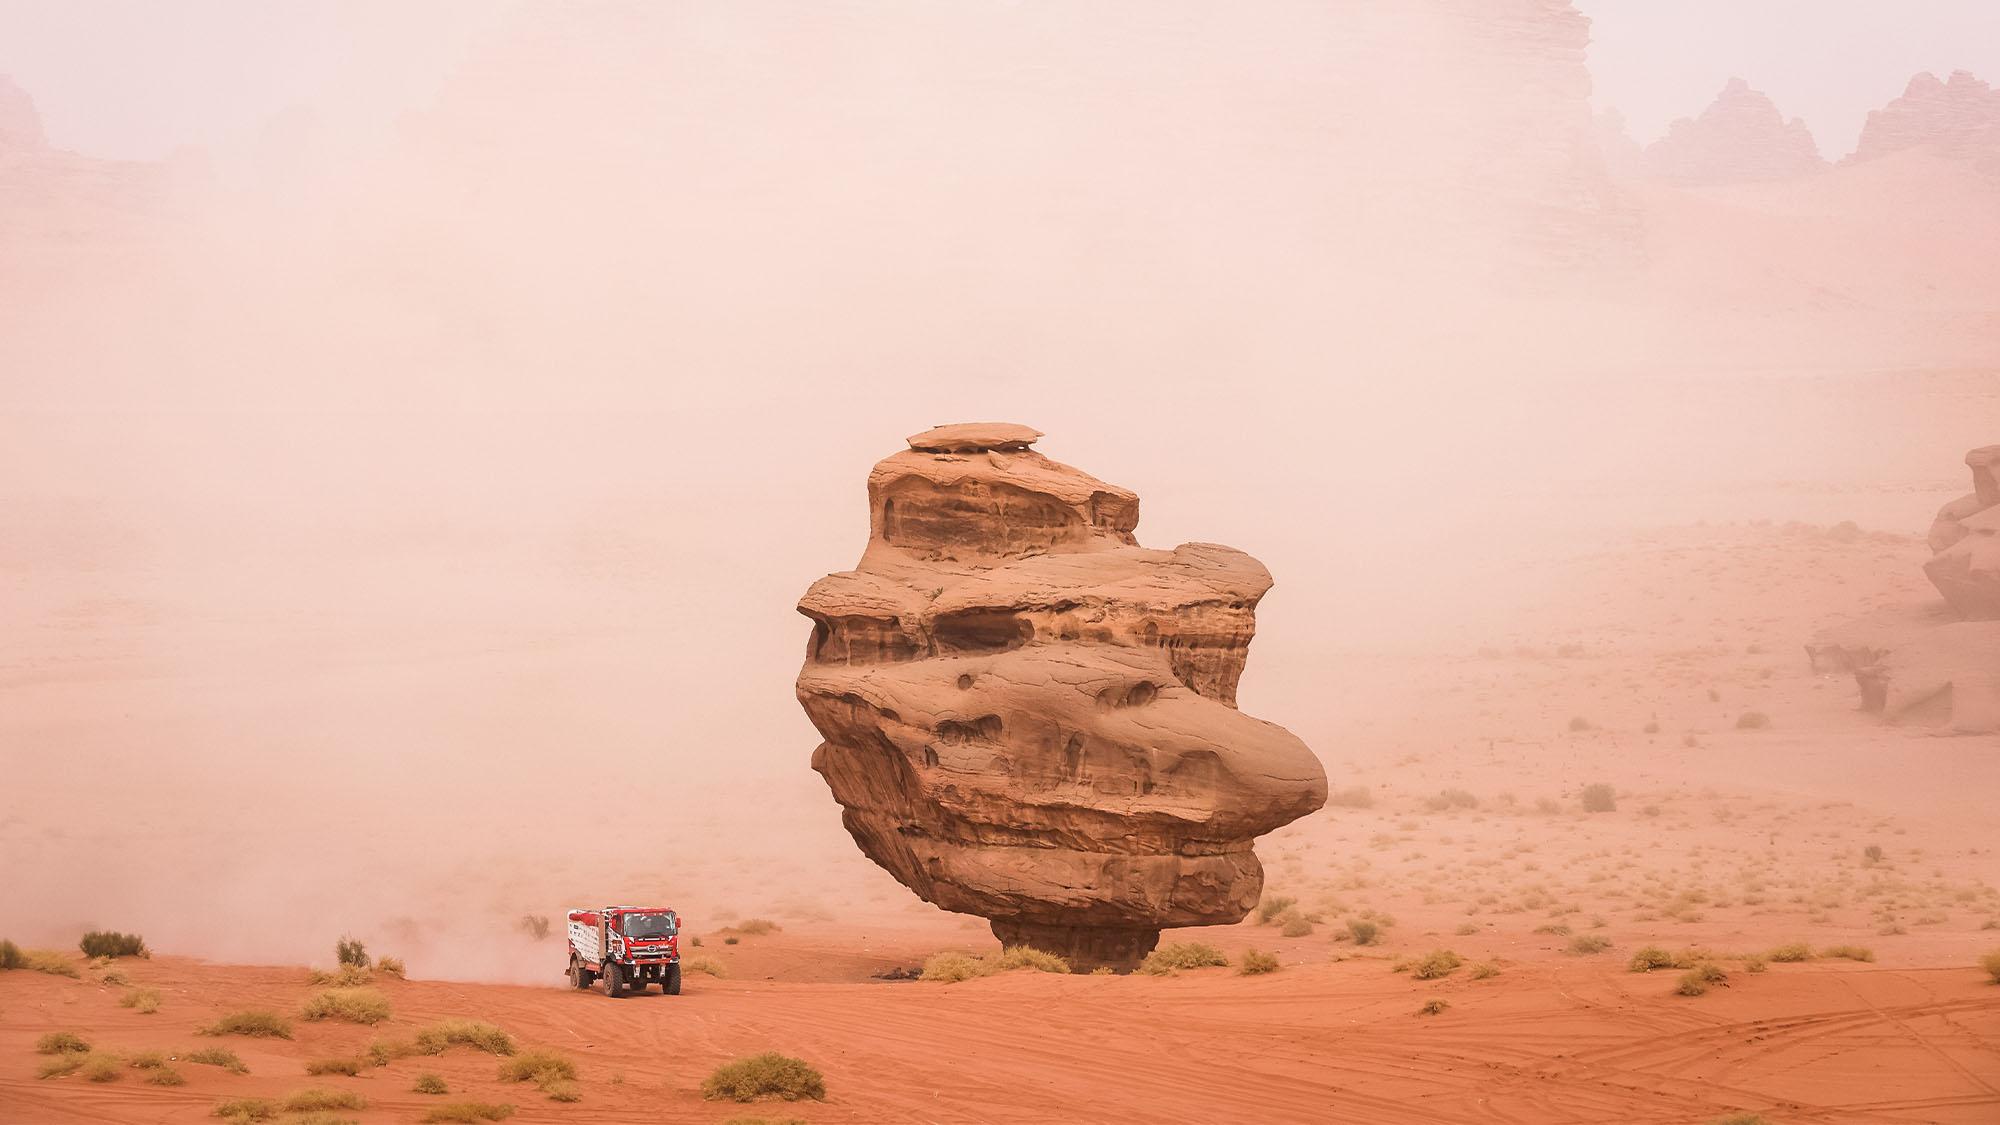 Sugawara Teruhito Dakar 2021